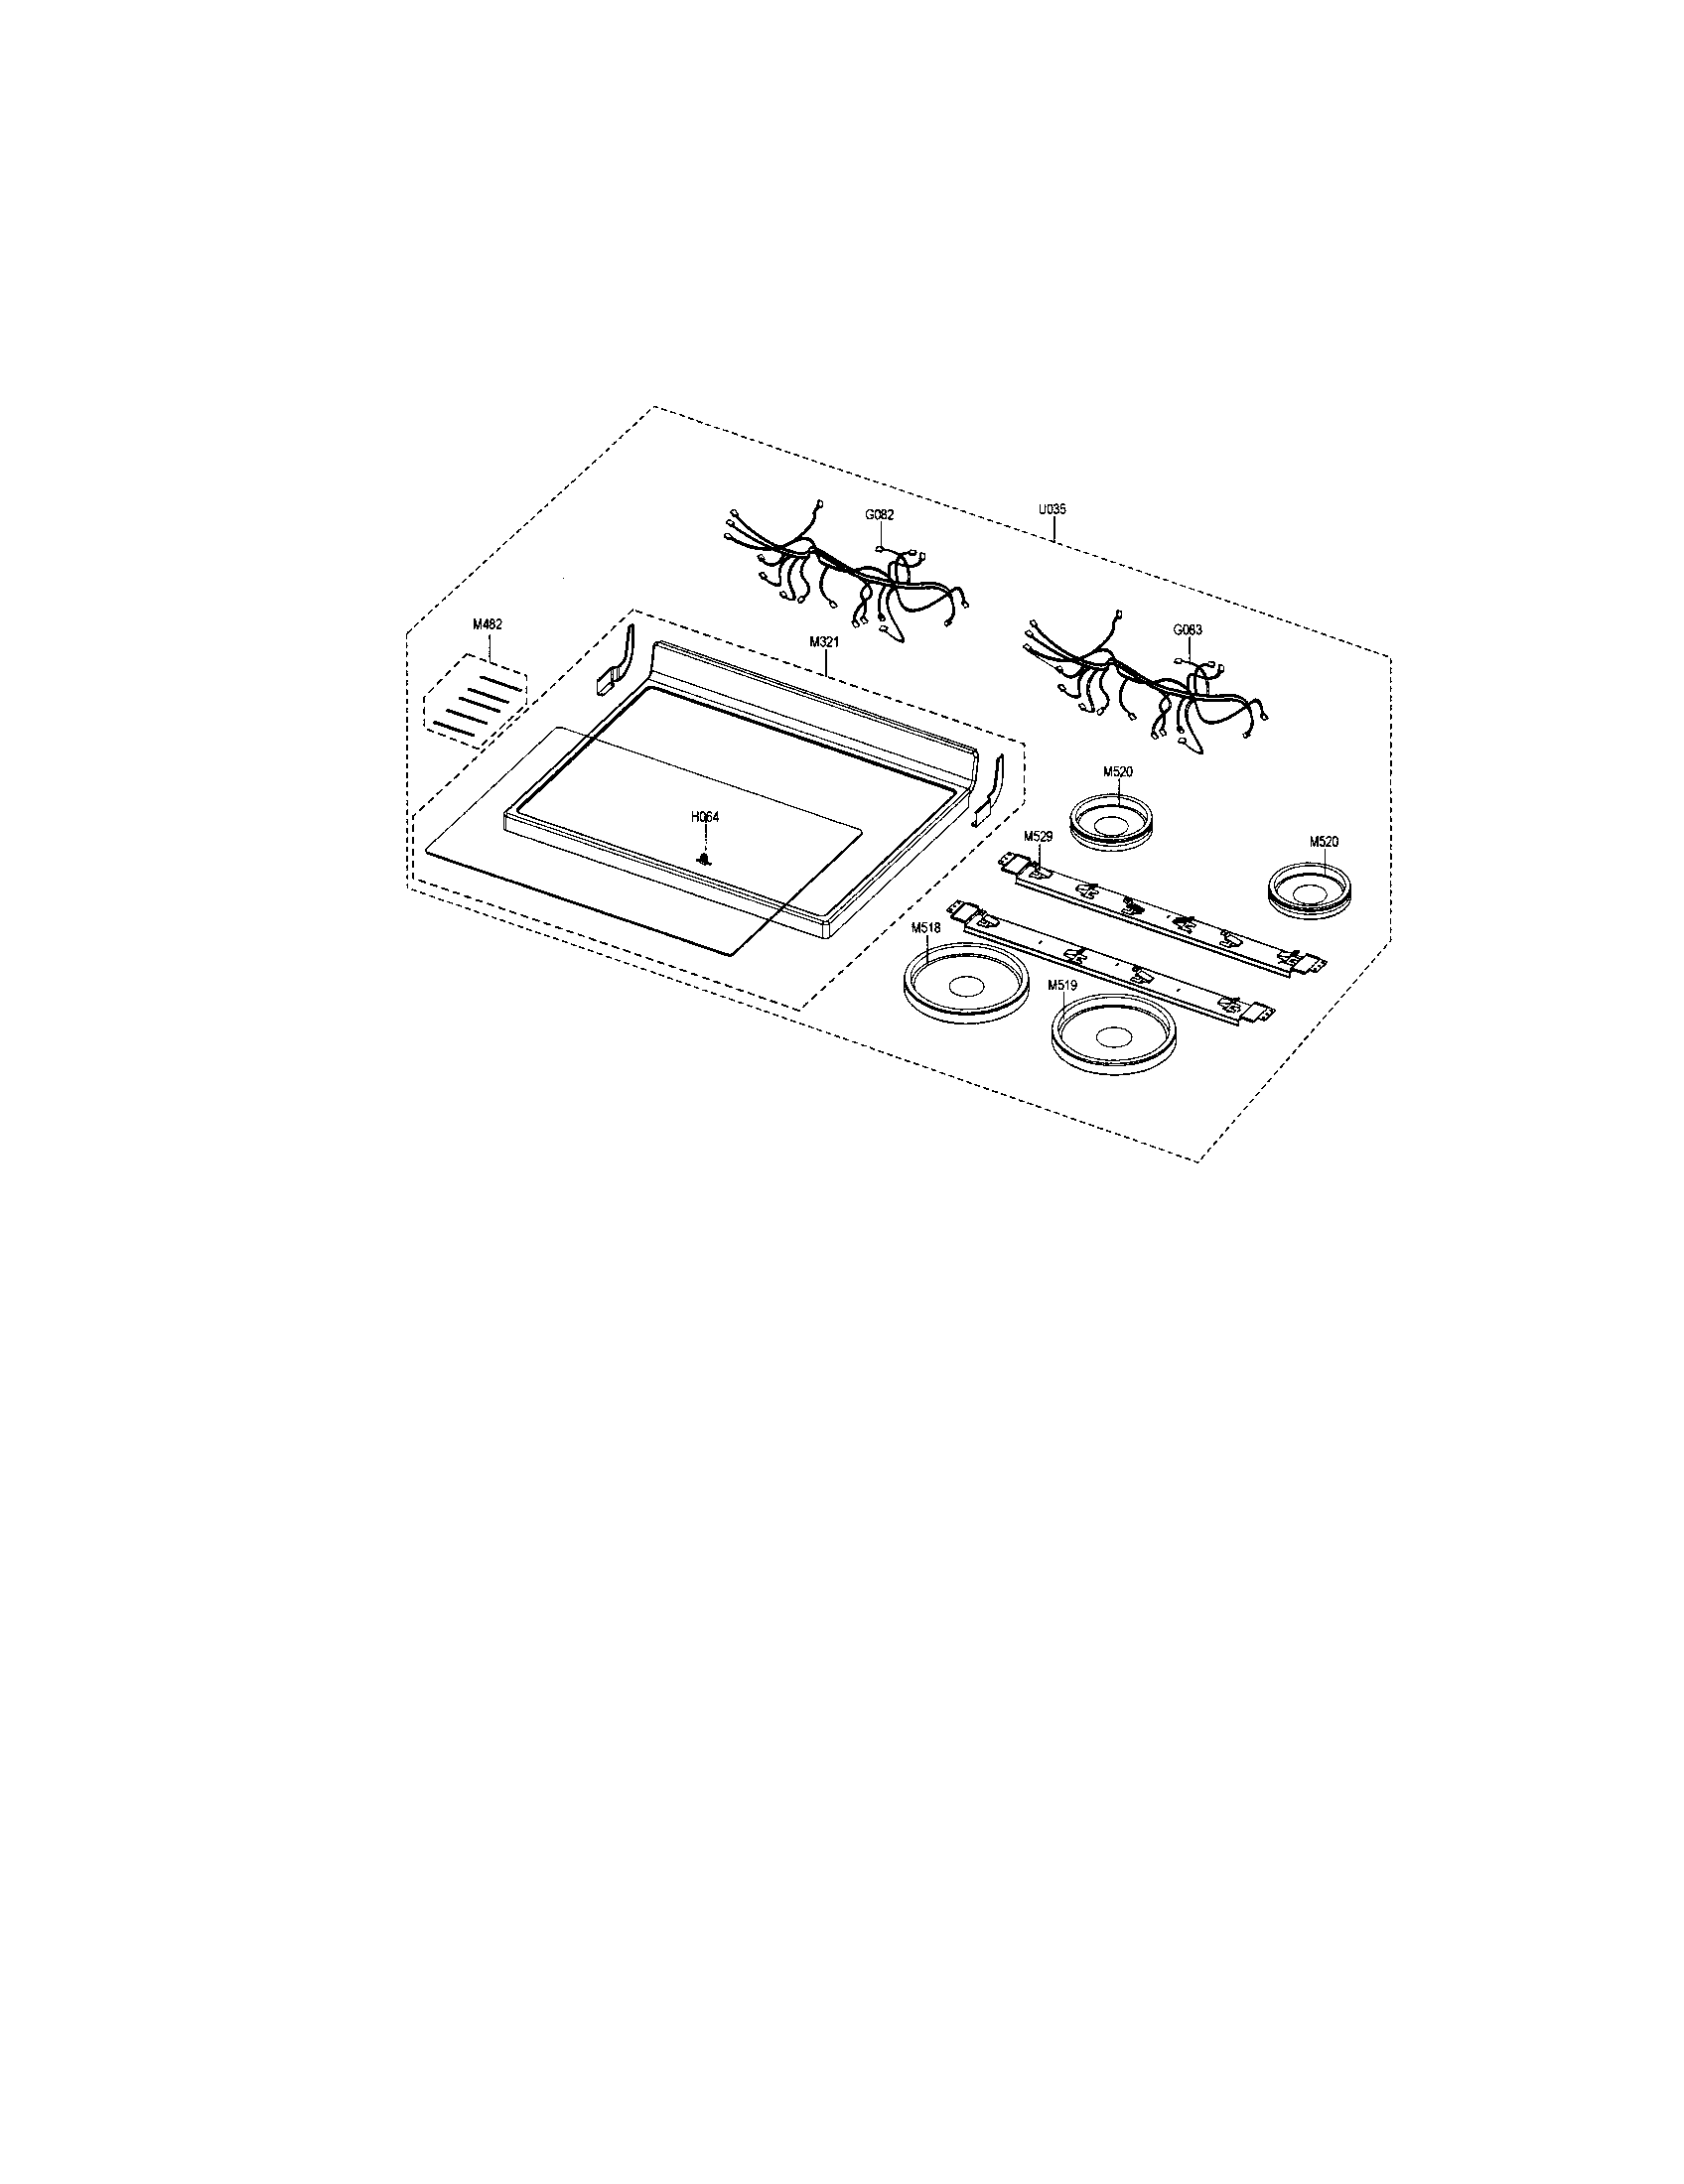 (29 parts)